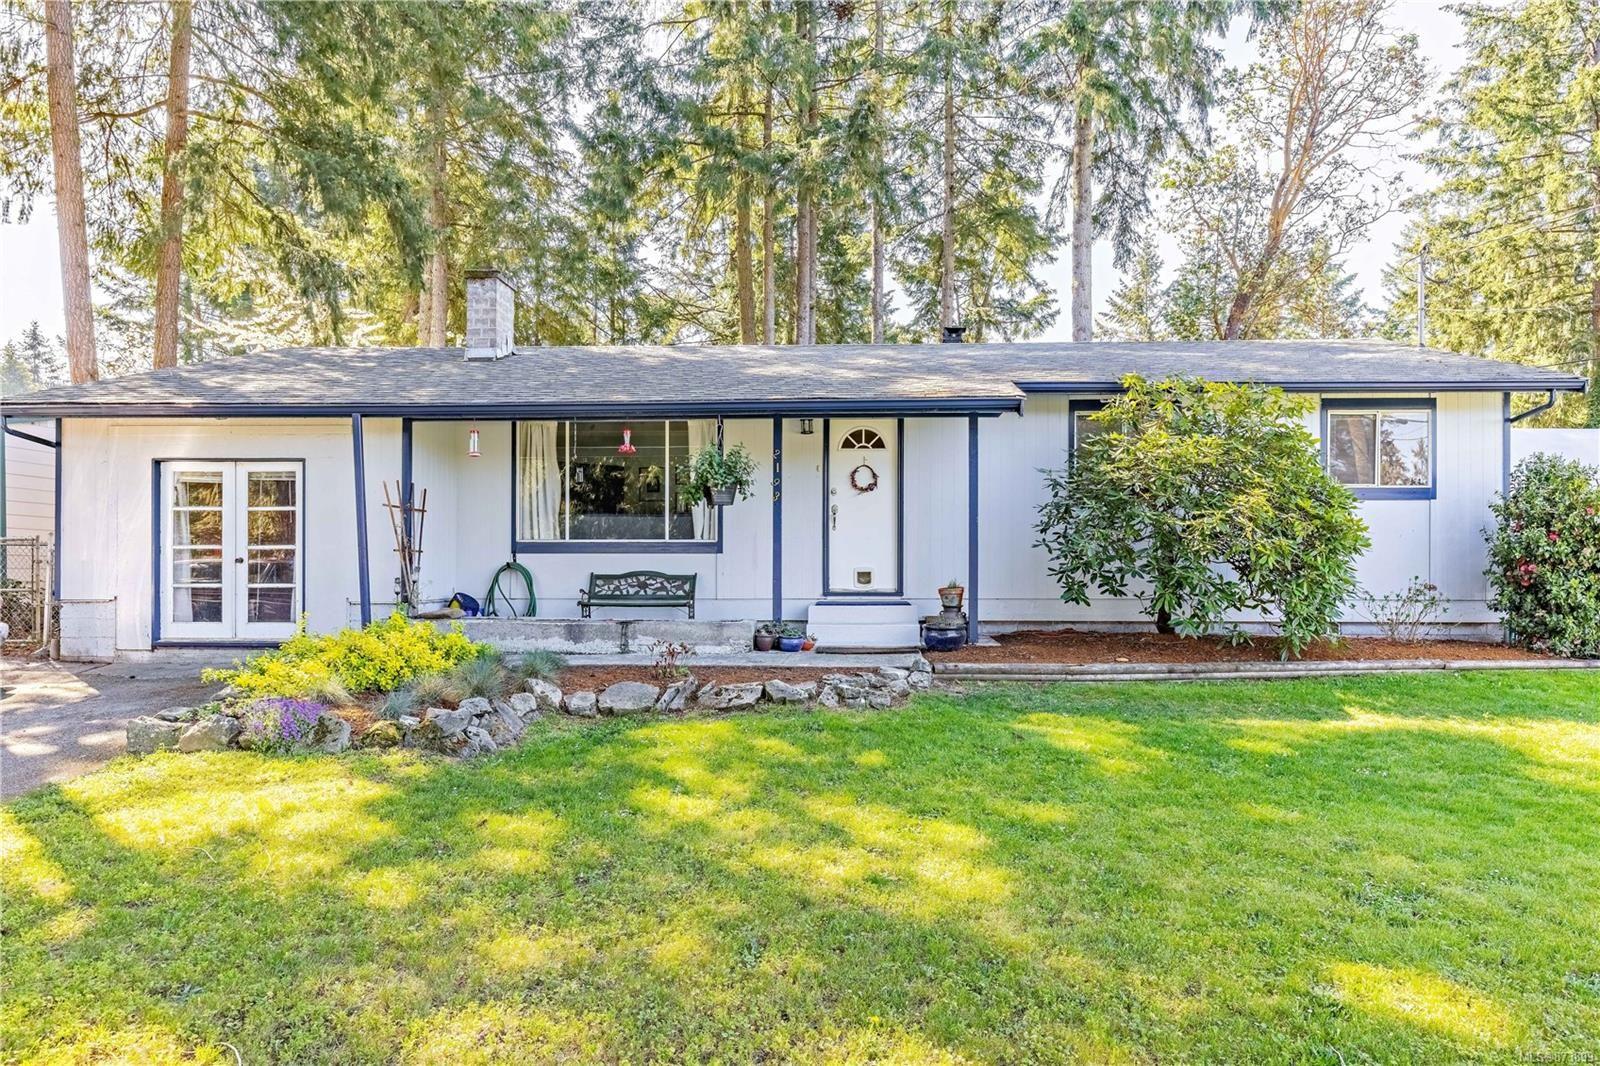 Main Photo: 2193 Blue Jay Way in : Na Cedar House for sale (Nanaimo)  : MLS®# 873899